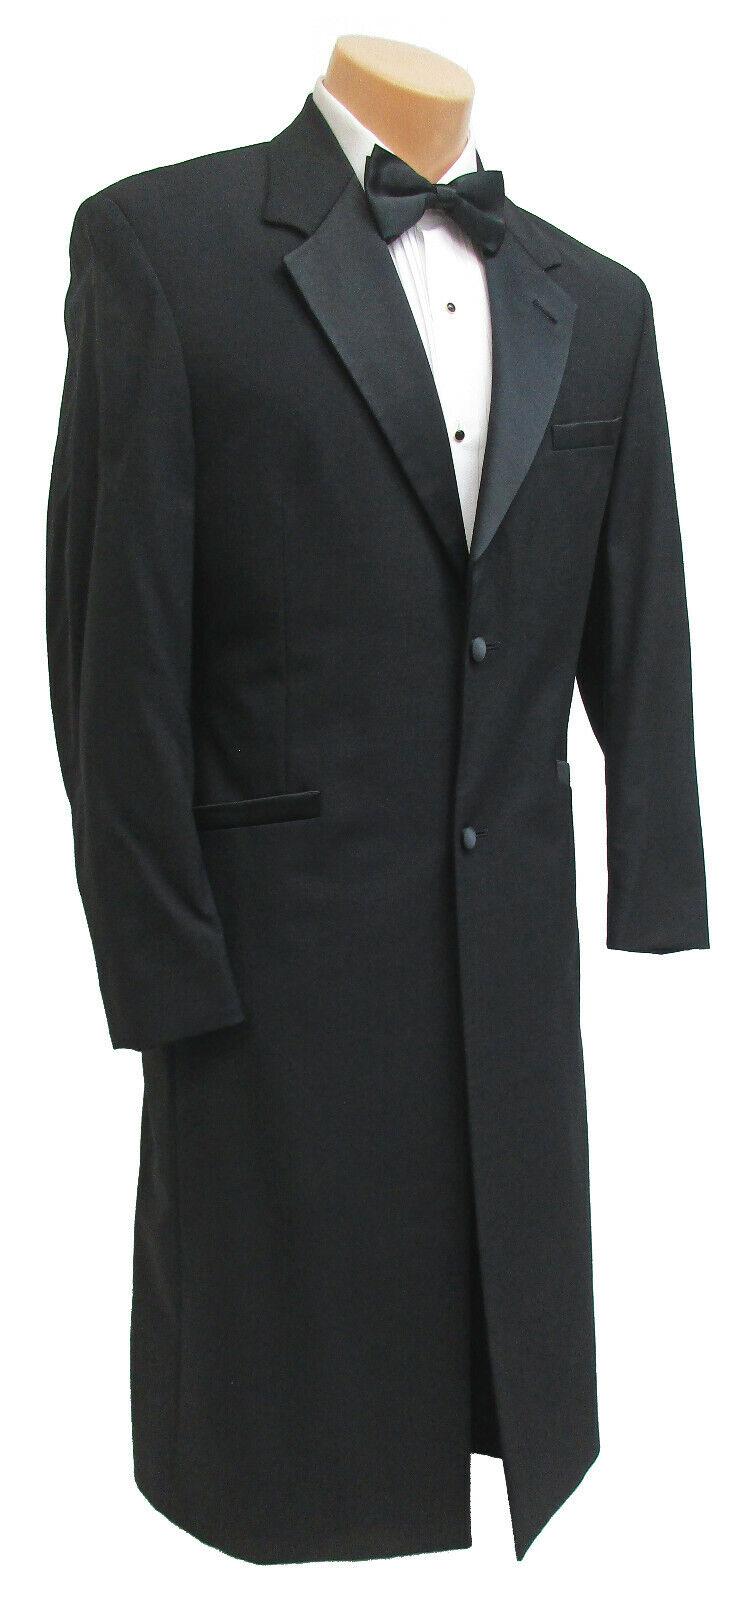 Men's Long Black Andrew Fezza Tuxedo Frock Coat Church Wedding Formal Mason 38R